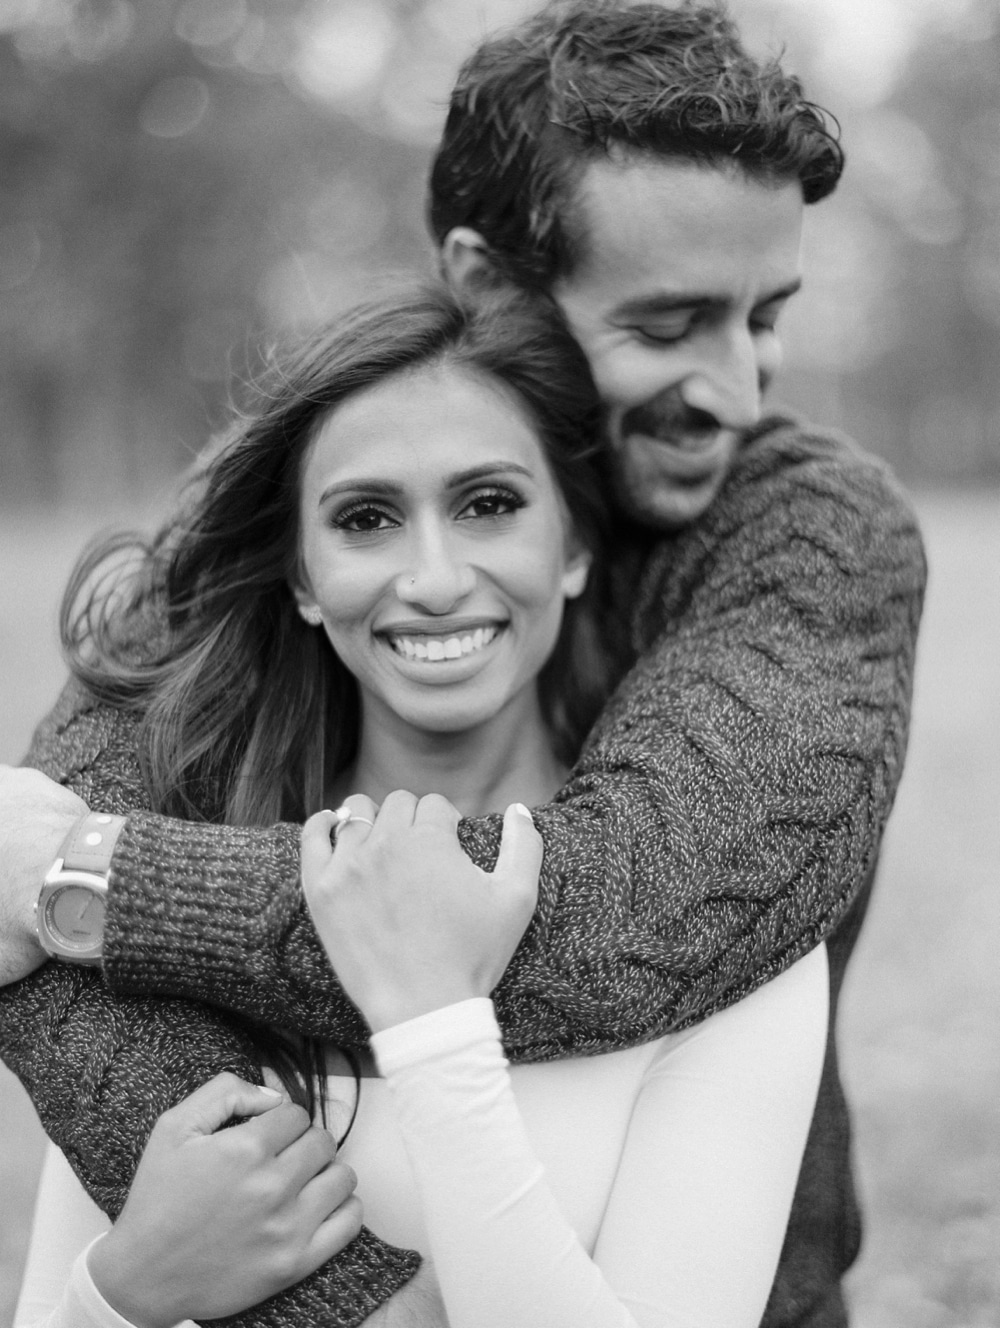 Kristin-La-Voie-Photography-morton-arboretum-chicago-wedding-photographer-123